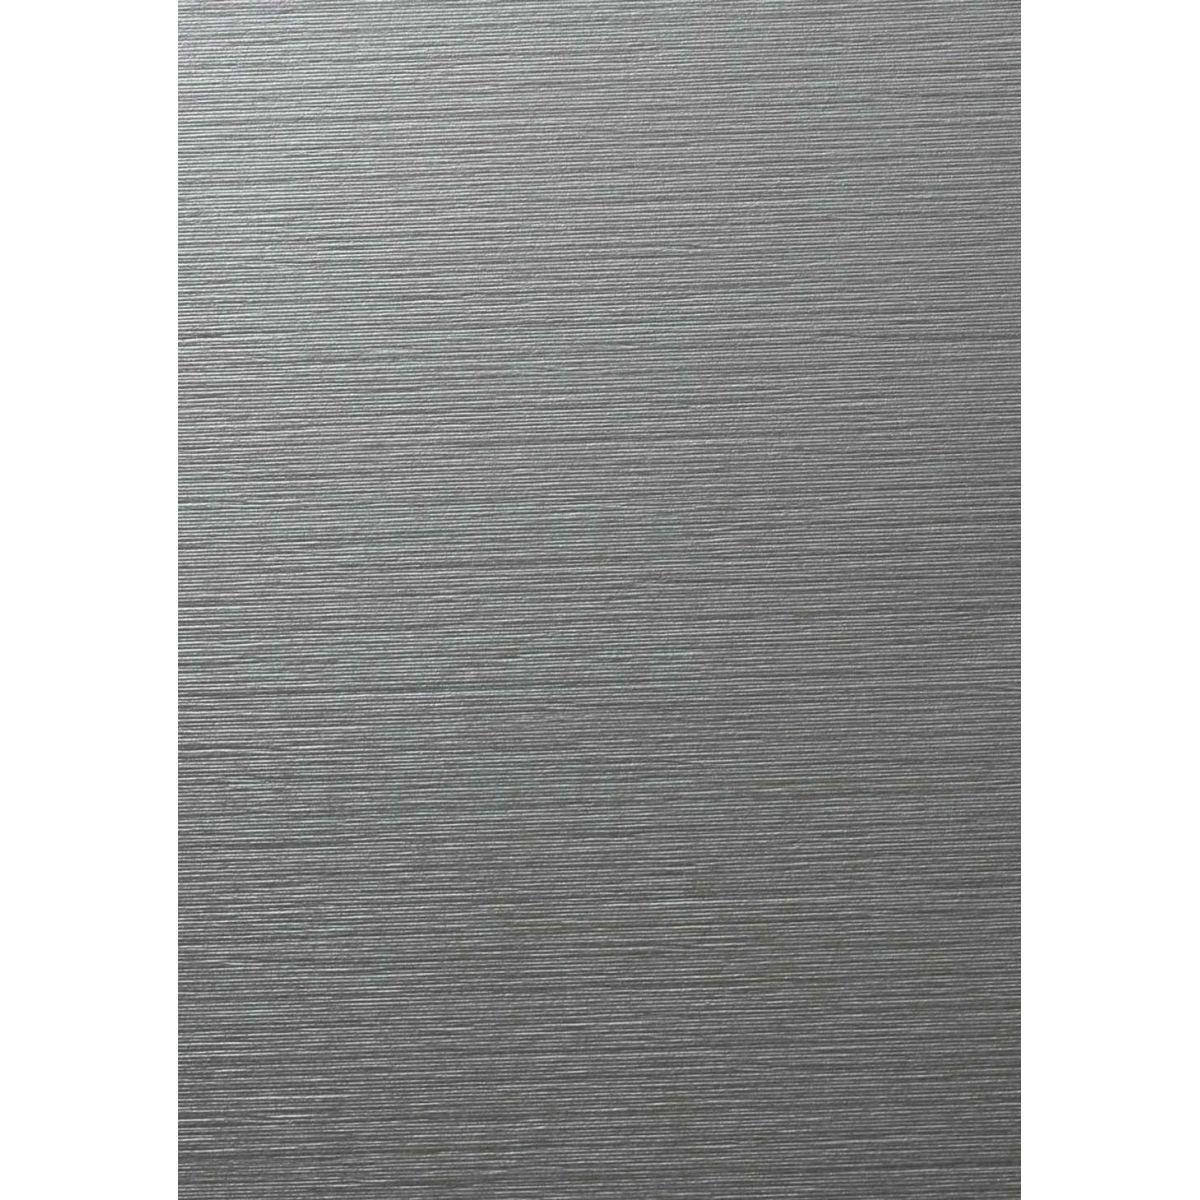 Papel Constellation Jade Metal - 215g